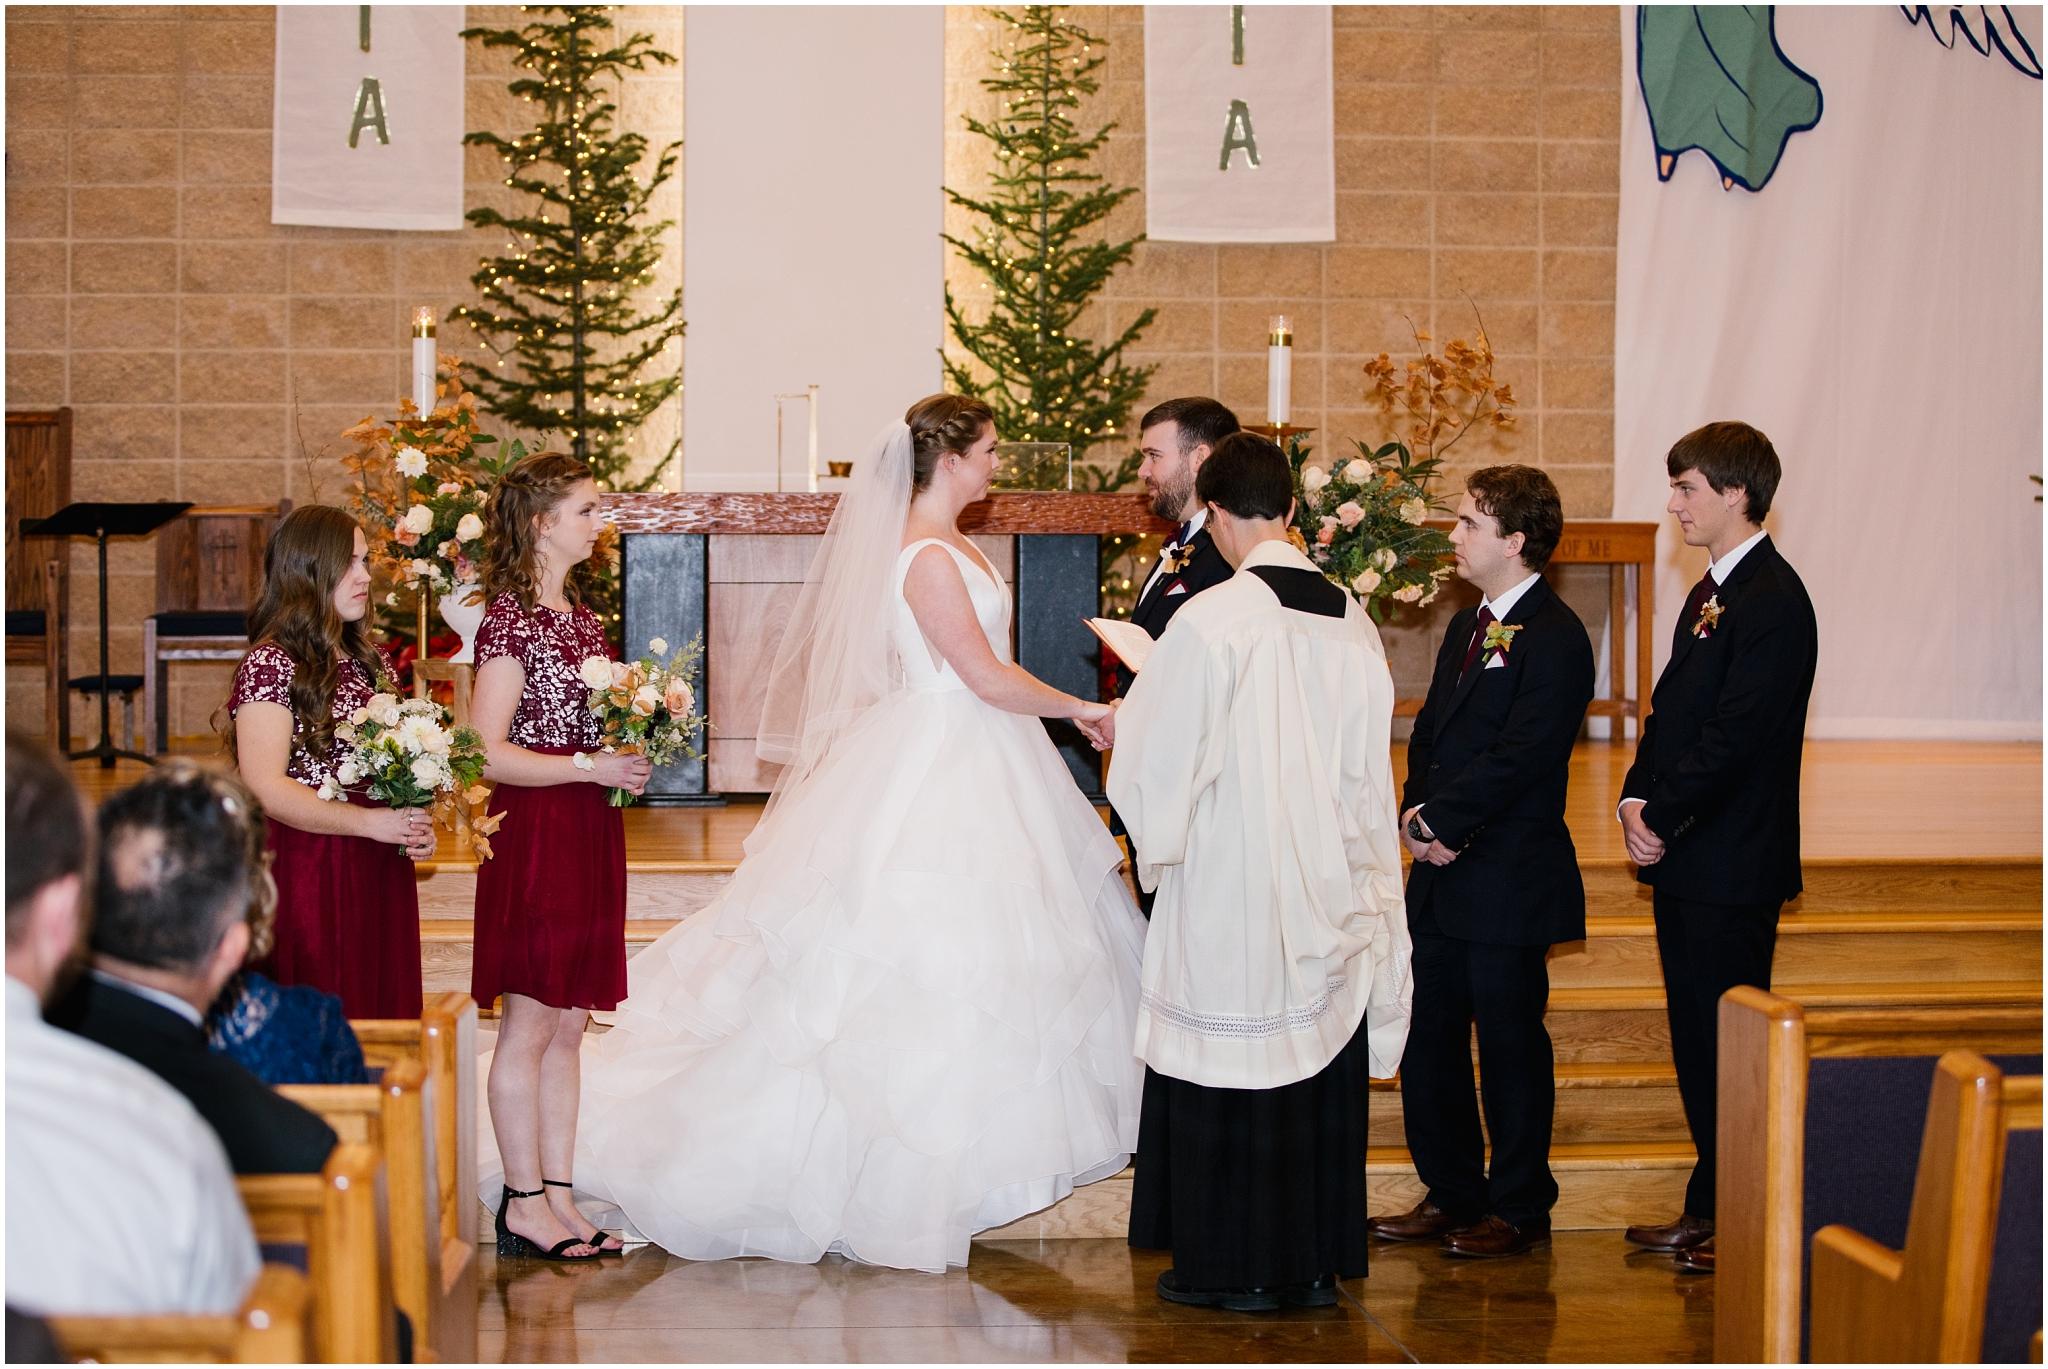 CN-Wedding-141_Lizzie-B-Imagery-Utah-Wedding-Photographer-Blessed-Sacrament-Catholic-Church-Sandy-Utah-The-Blended-Table-Salt-Lake-City.jpg